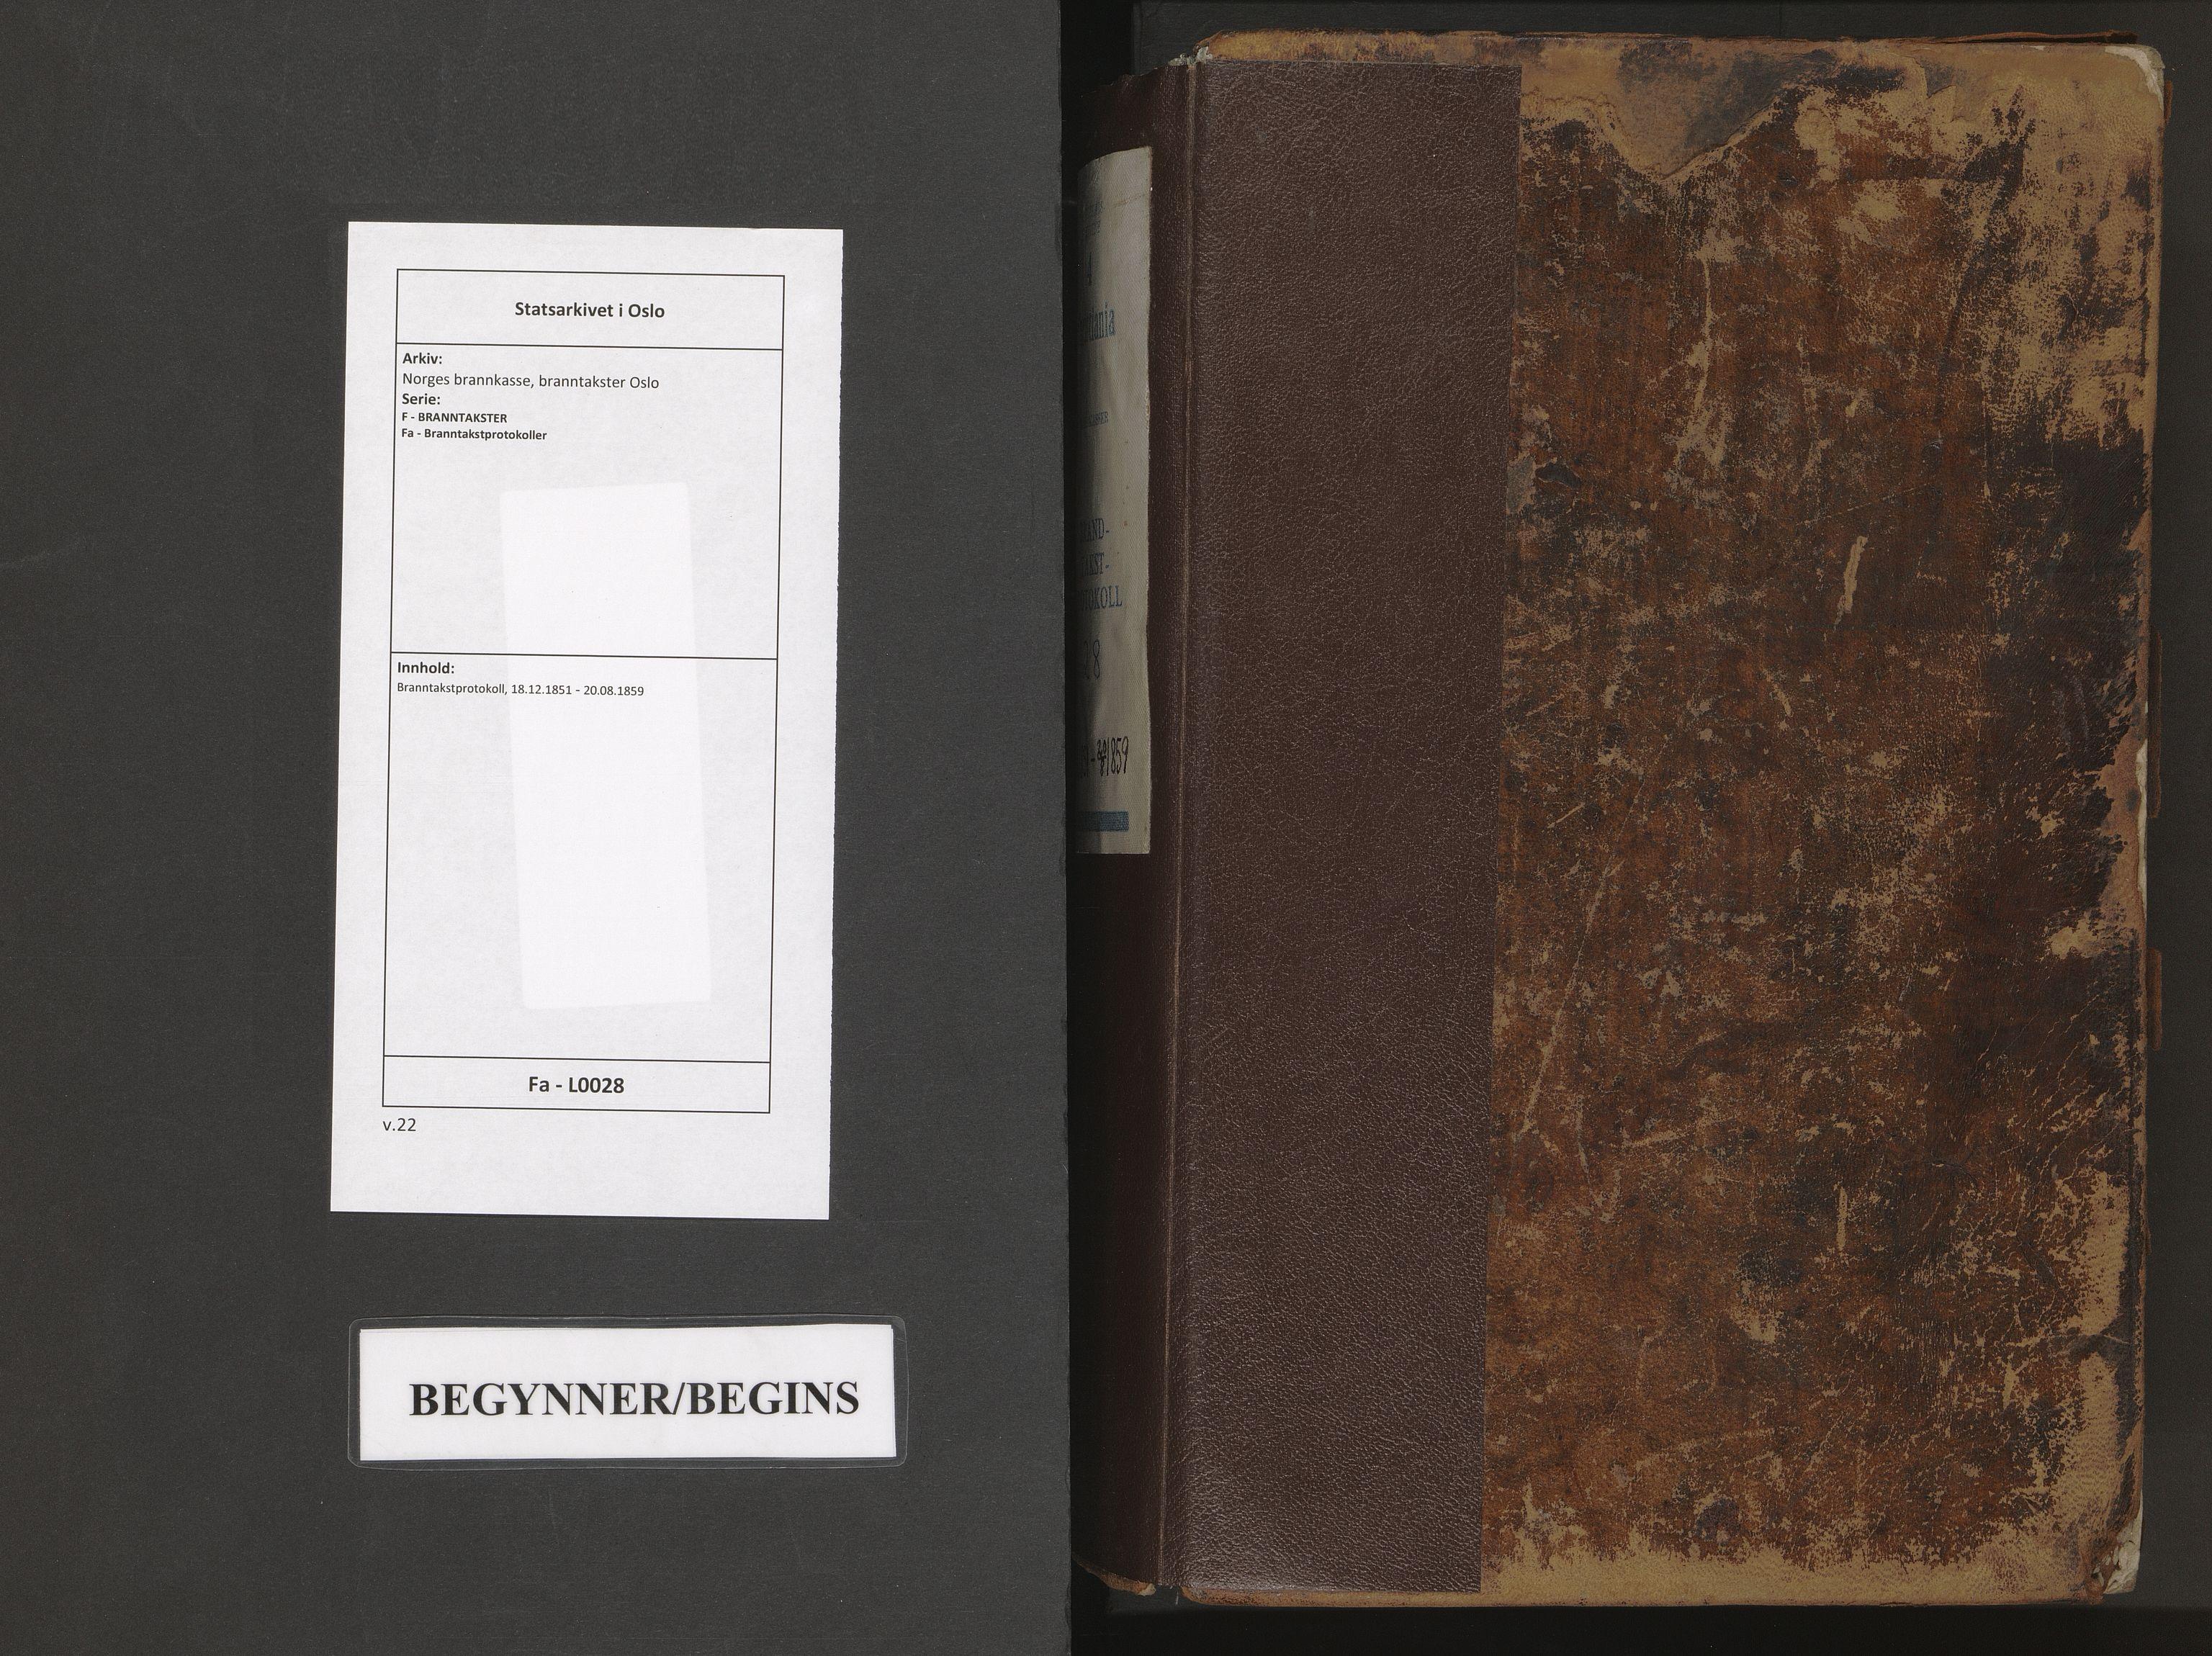 SAO, Norges brannkasse, branntakster Oslo, F/Fa/L0028: Branntakstprotokoll, 1851-1859